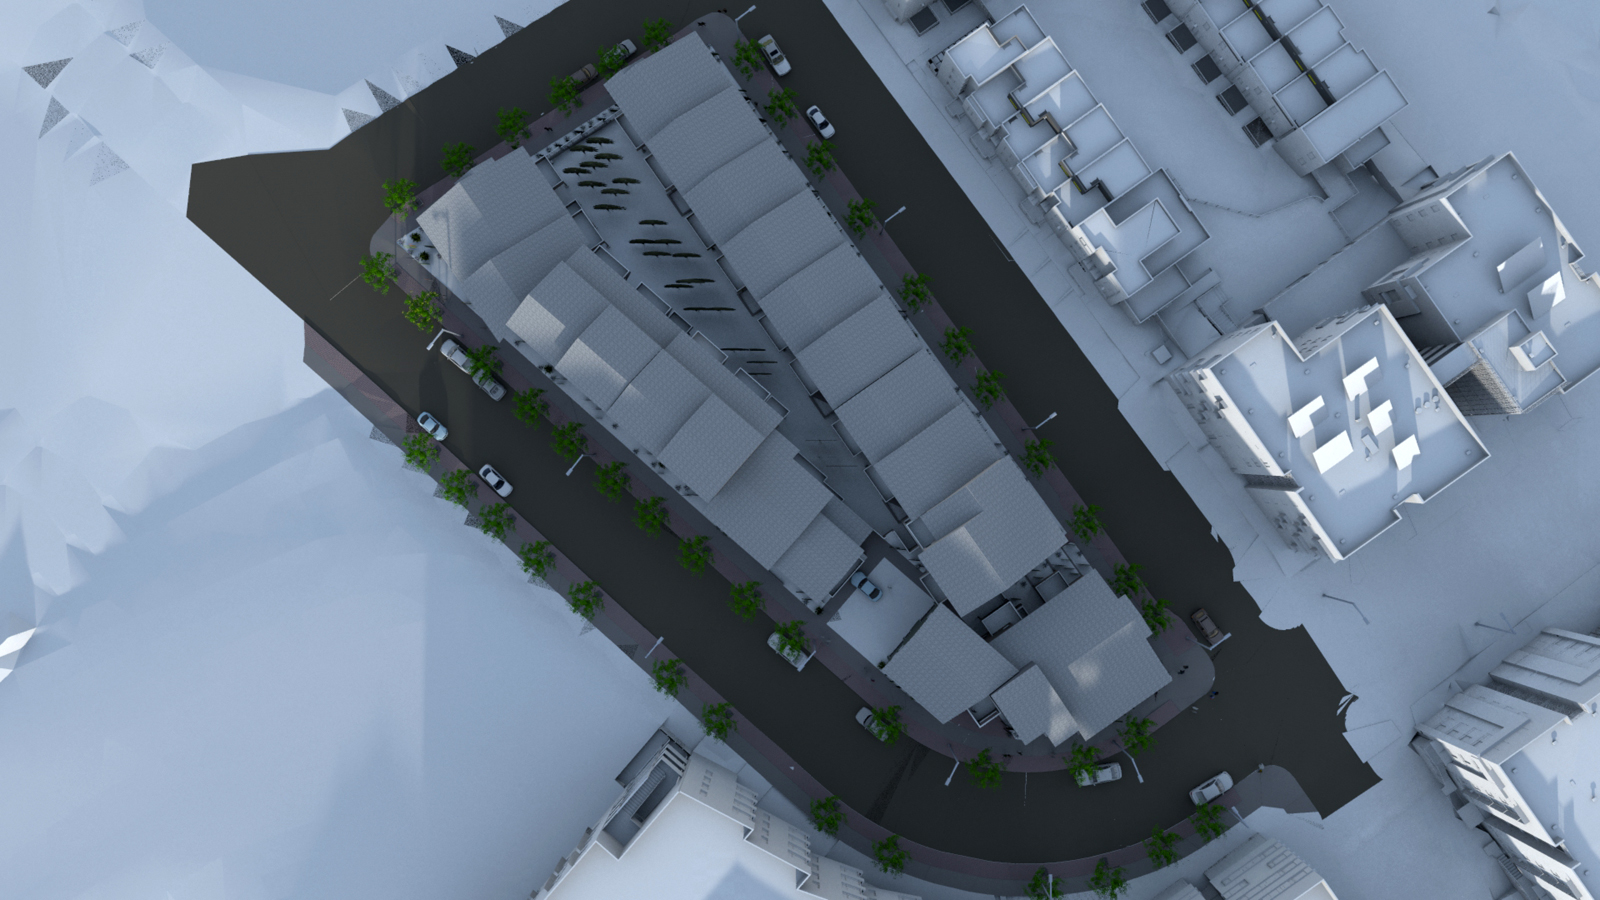 201403 12-7-16 Block 8 Site Plan.jpg